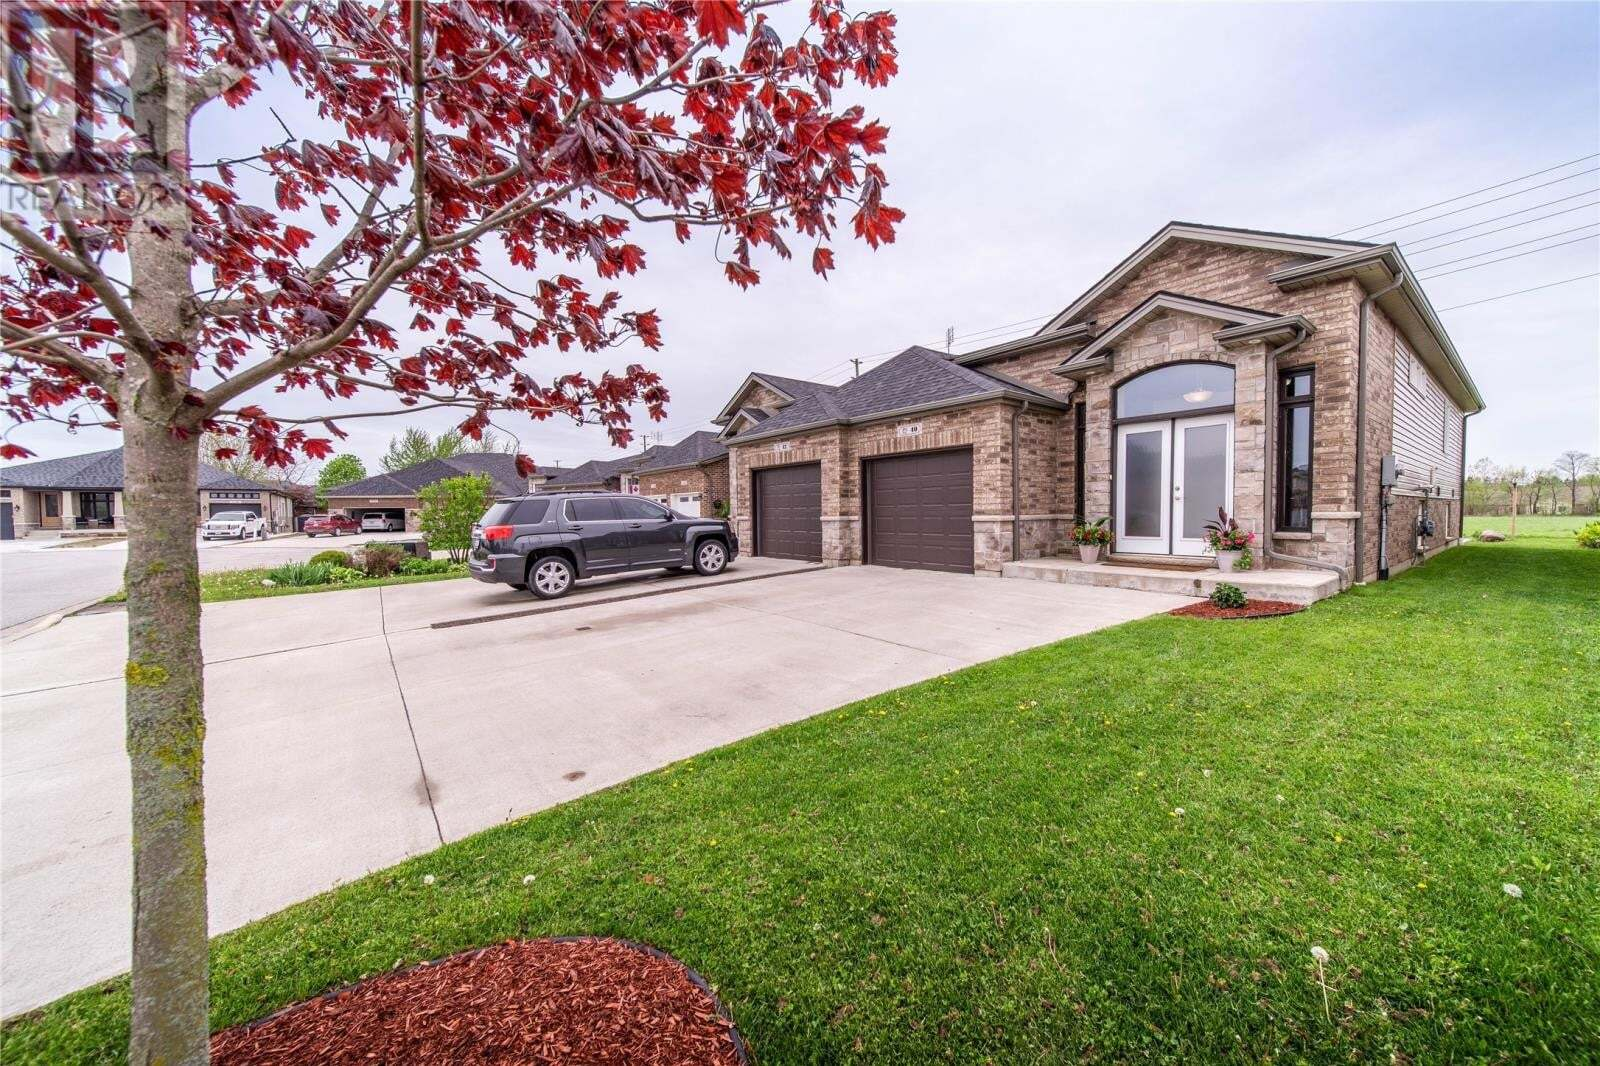 House for sale at 40 Hazel  Kingsville Ontario - MLS: 20005750